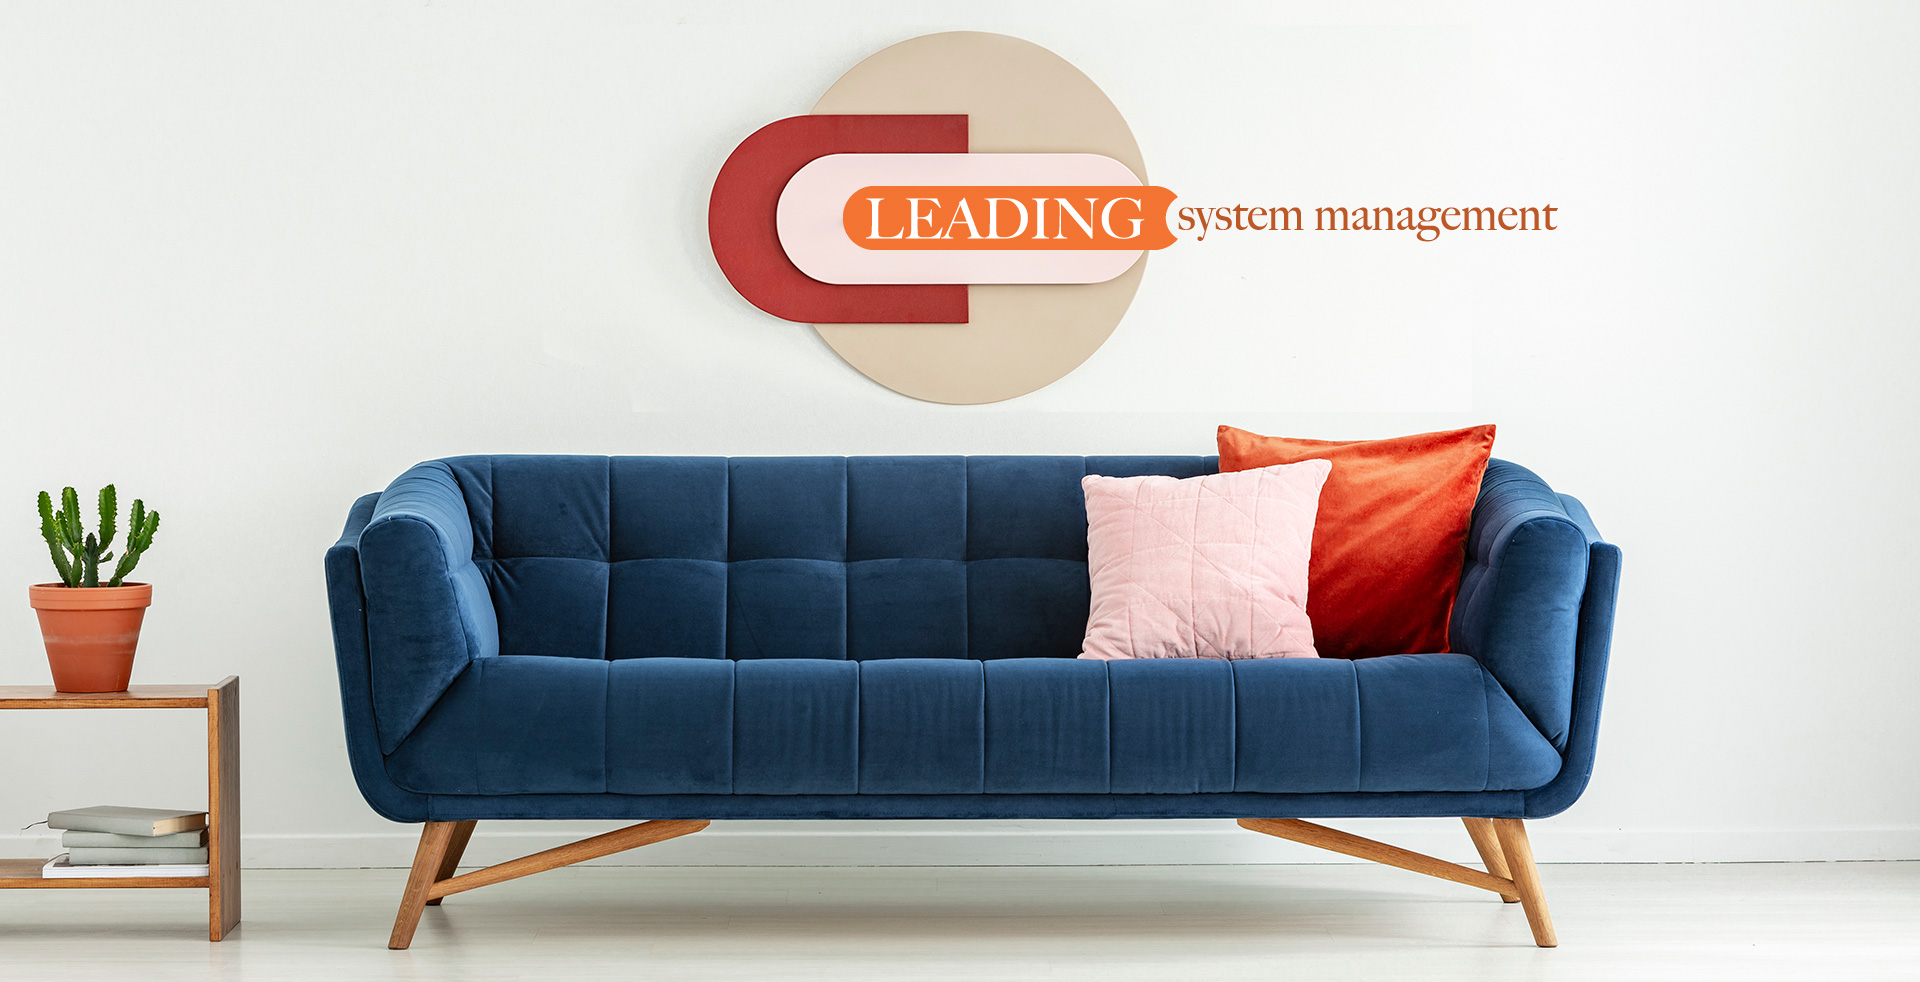 https://www.studiochiesa.it/wp-content/uploads/2020/07/SC-Studio-Chiesa-Communication_Servizi-Leading-System-logo.jpg